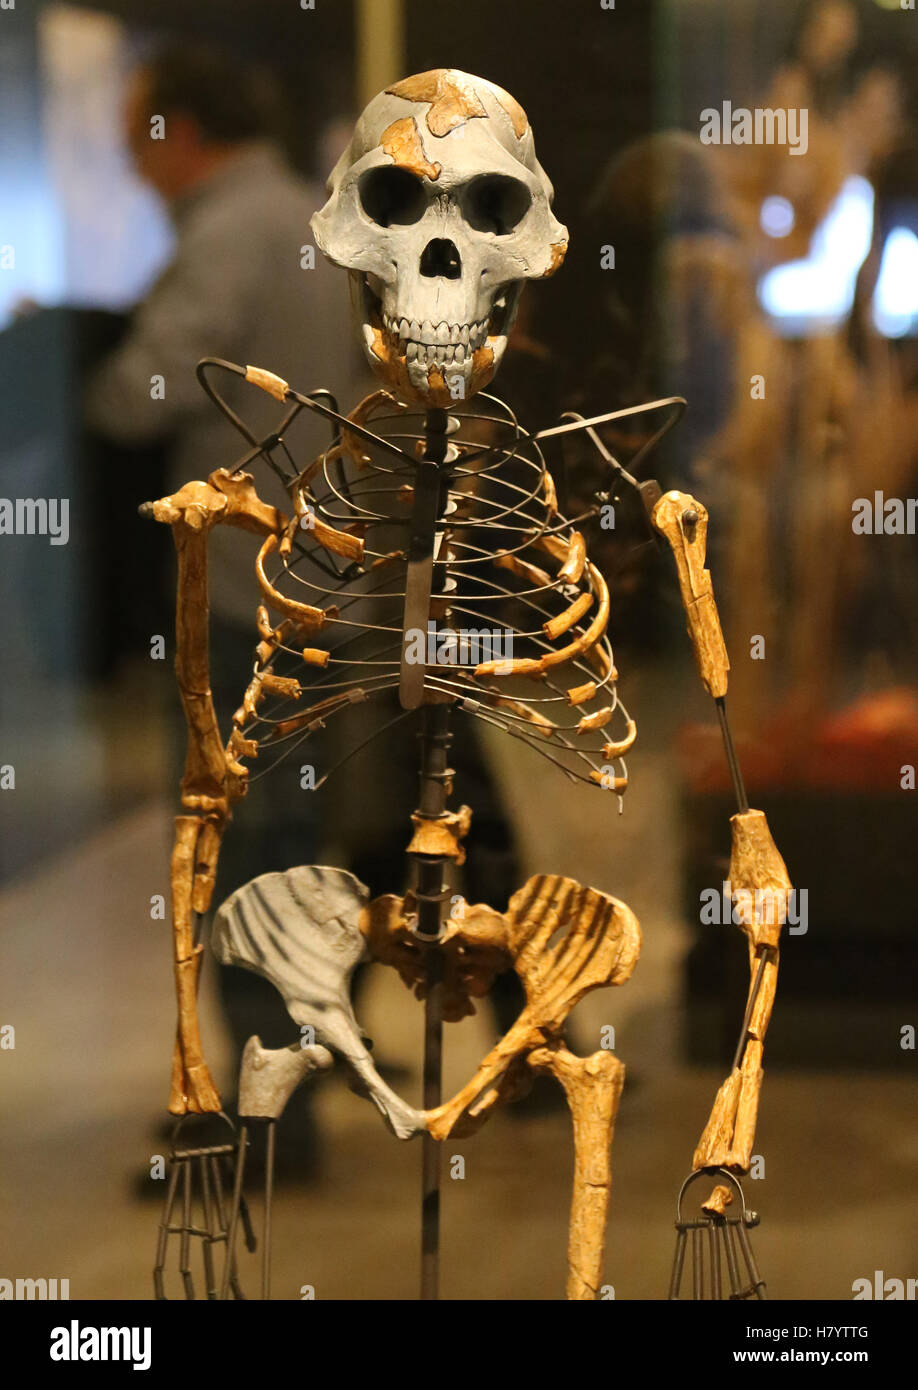 Australopithecus afarensis. Lucy. Adult female skeleton. 3.2 milion years ago. Ethiopia. Replica. National Archaeological - Stock Image